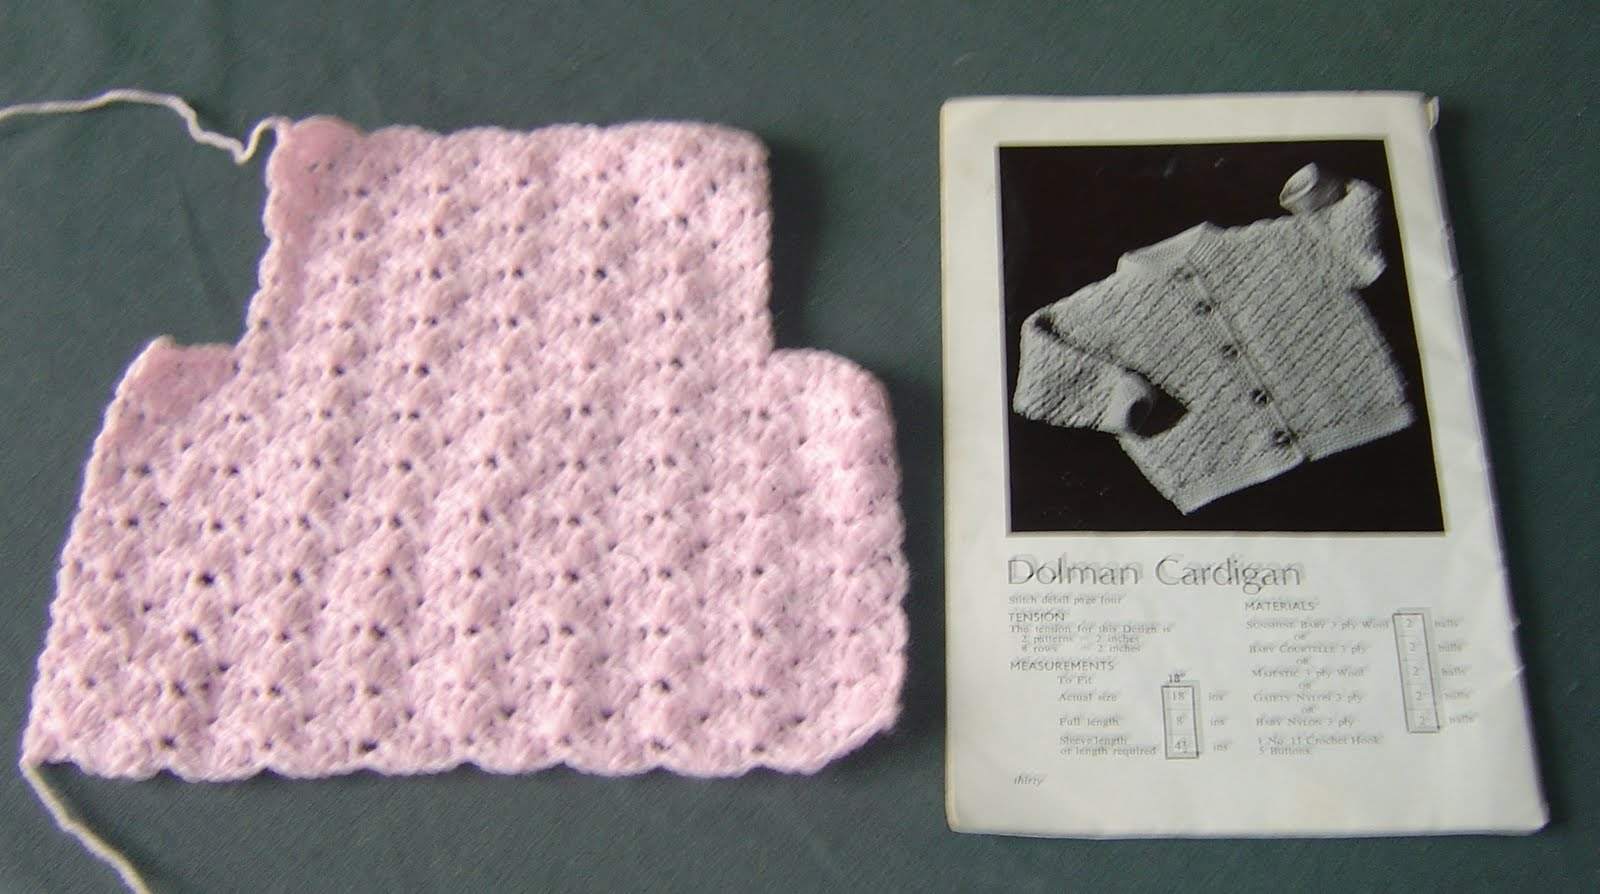 One Piece Crochet Baby Sweater Pattern Free: Tunisian crochet baby ...